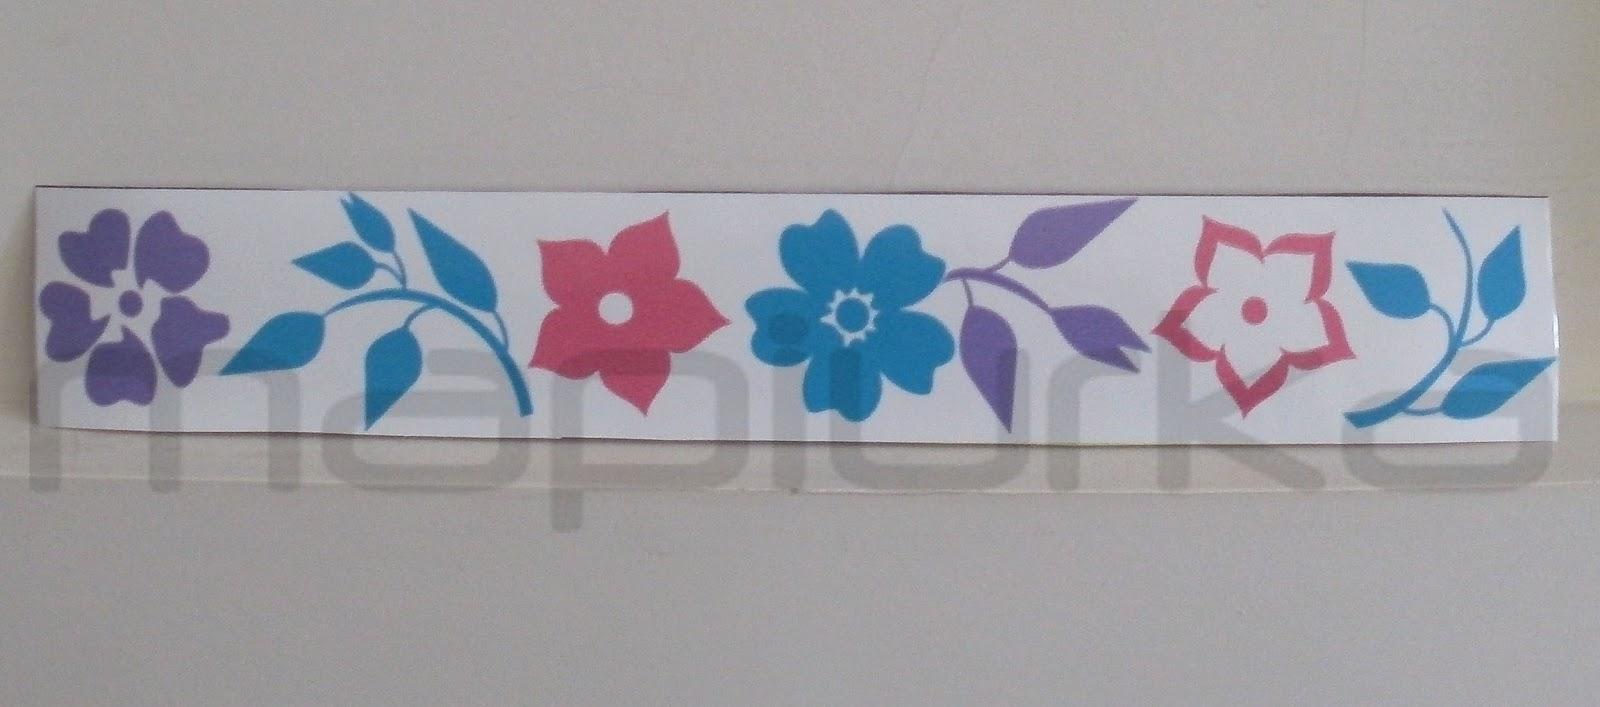 Mapiurka adhesivos decorativos ba guardas autoadhesivas - Placas decorativas para pared interior ...